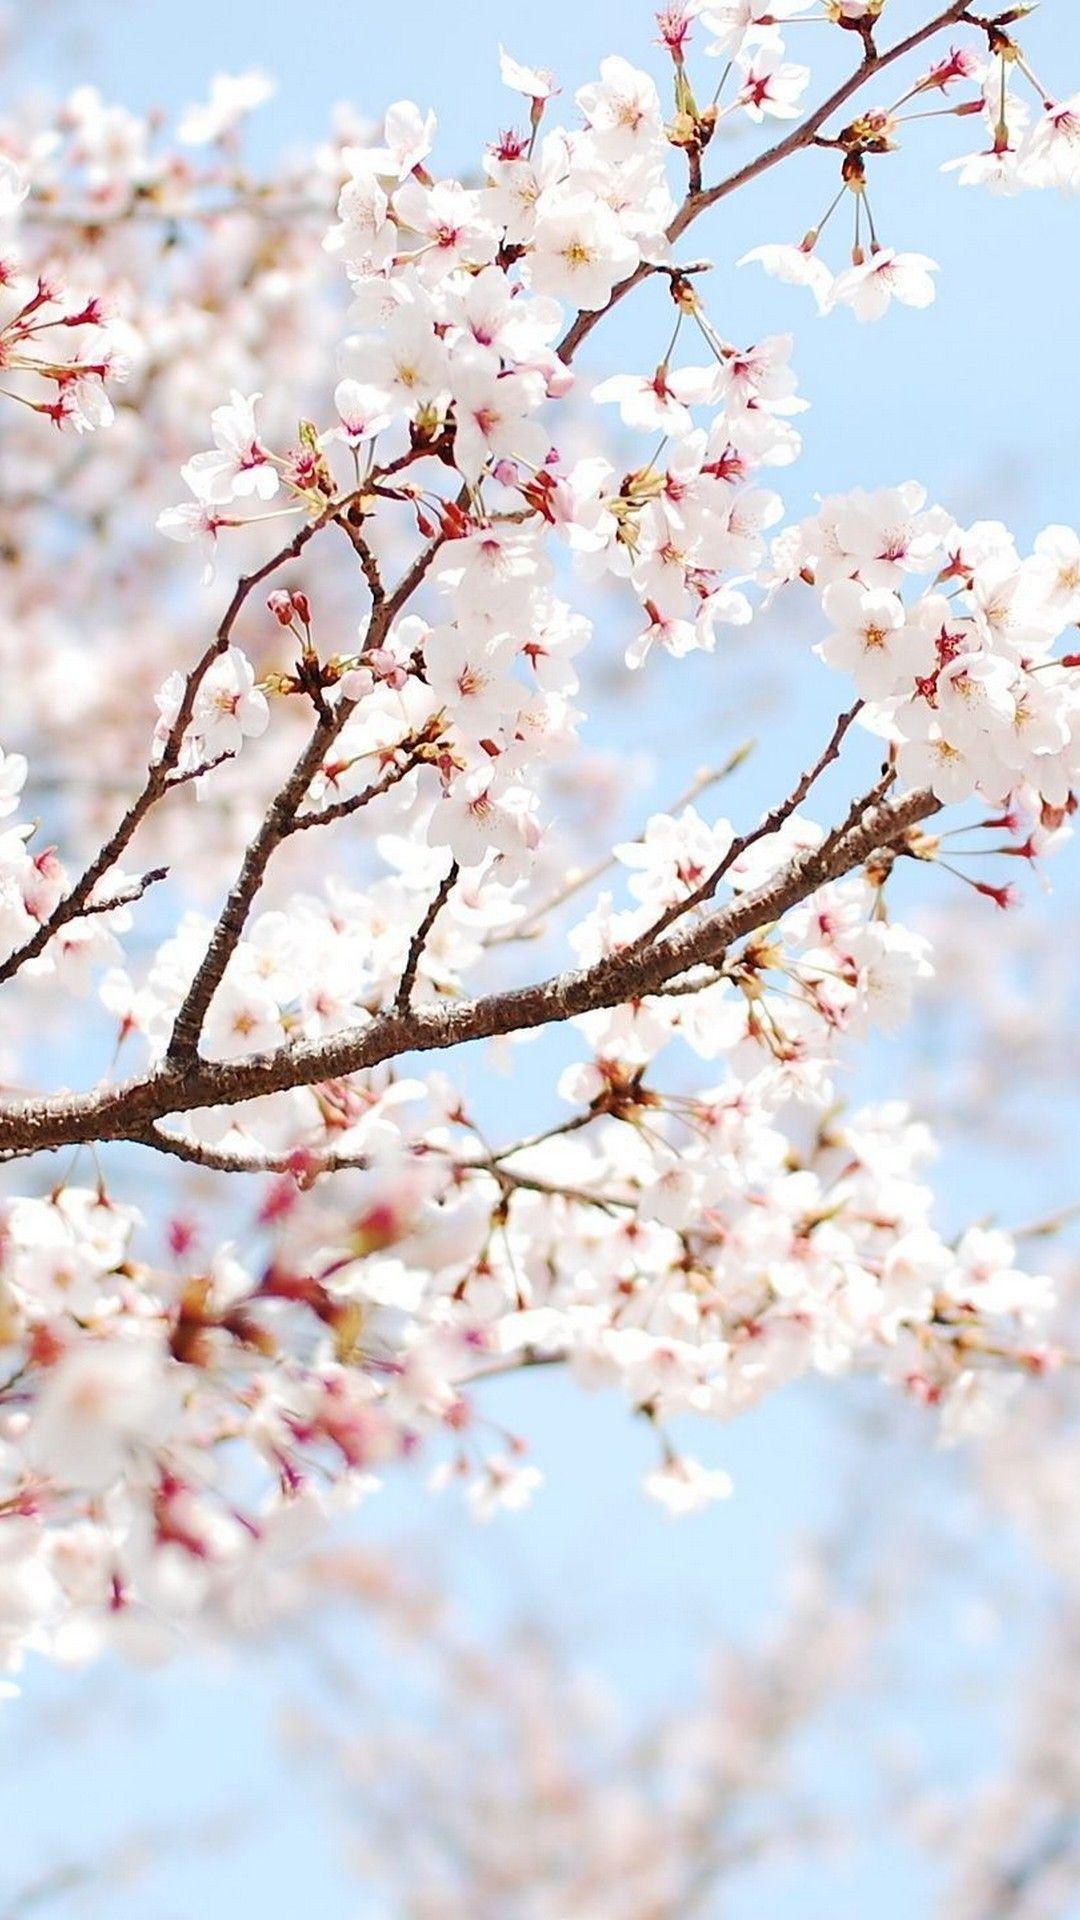 Spring Iphone Wallpaper Best Iphone Wallpaper Cherry Blossom Wallpaper Spring Wallpaper Flower Wallpaper